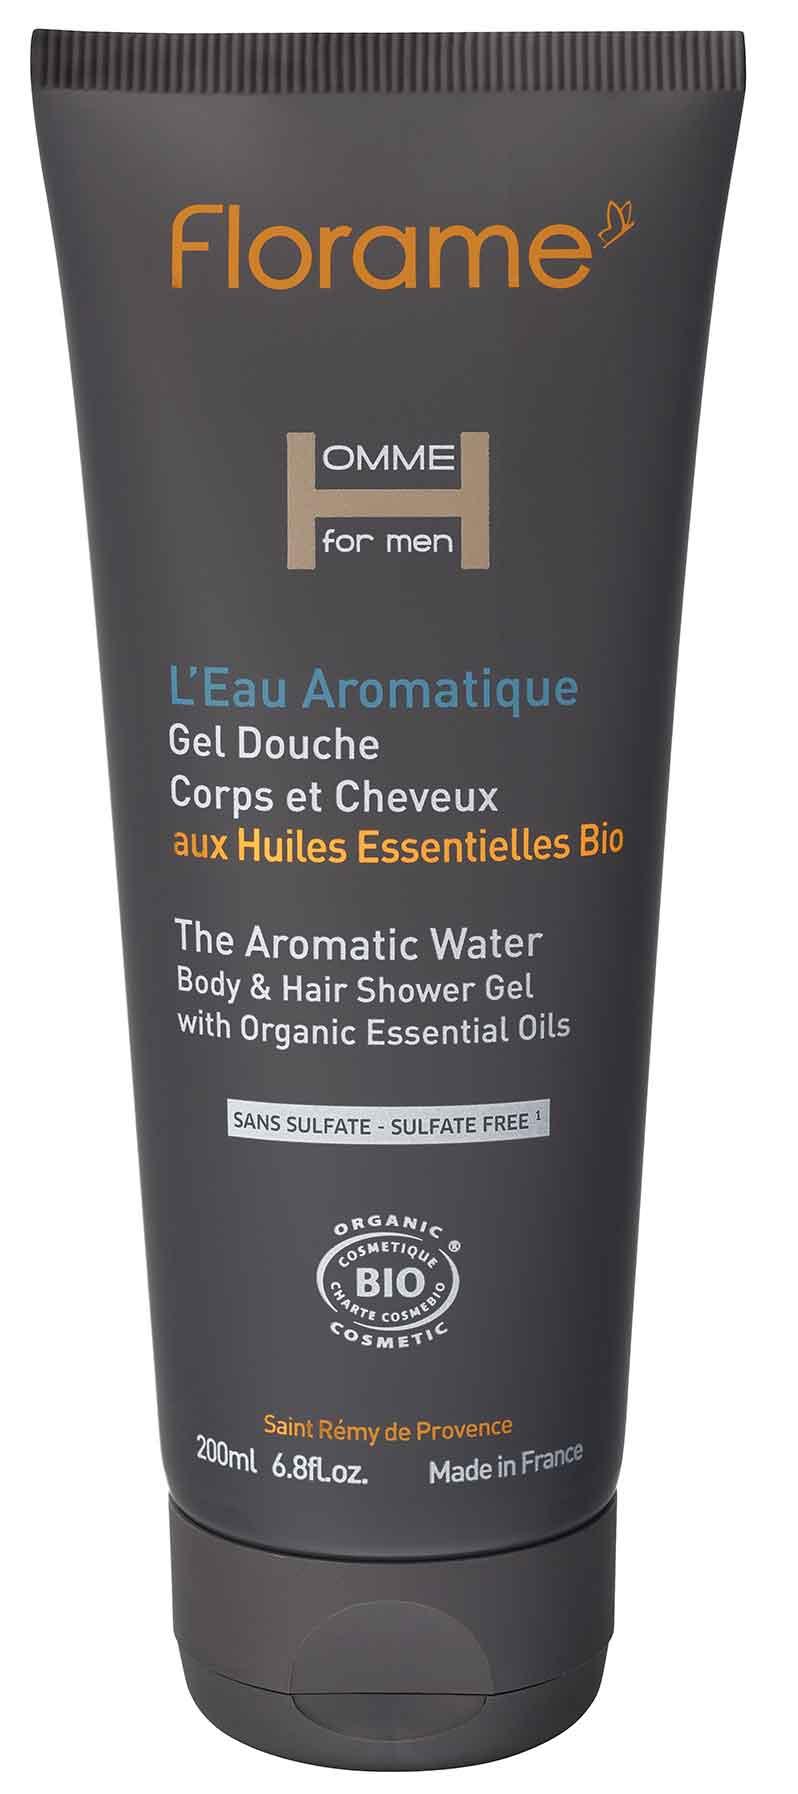 Organic men cosmetics thanks to Florame!